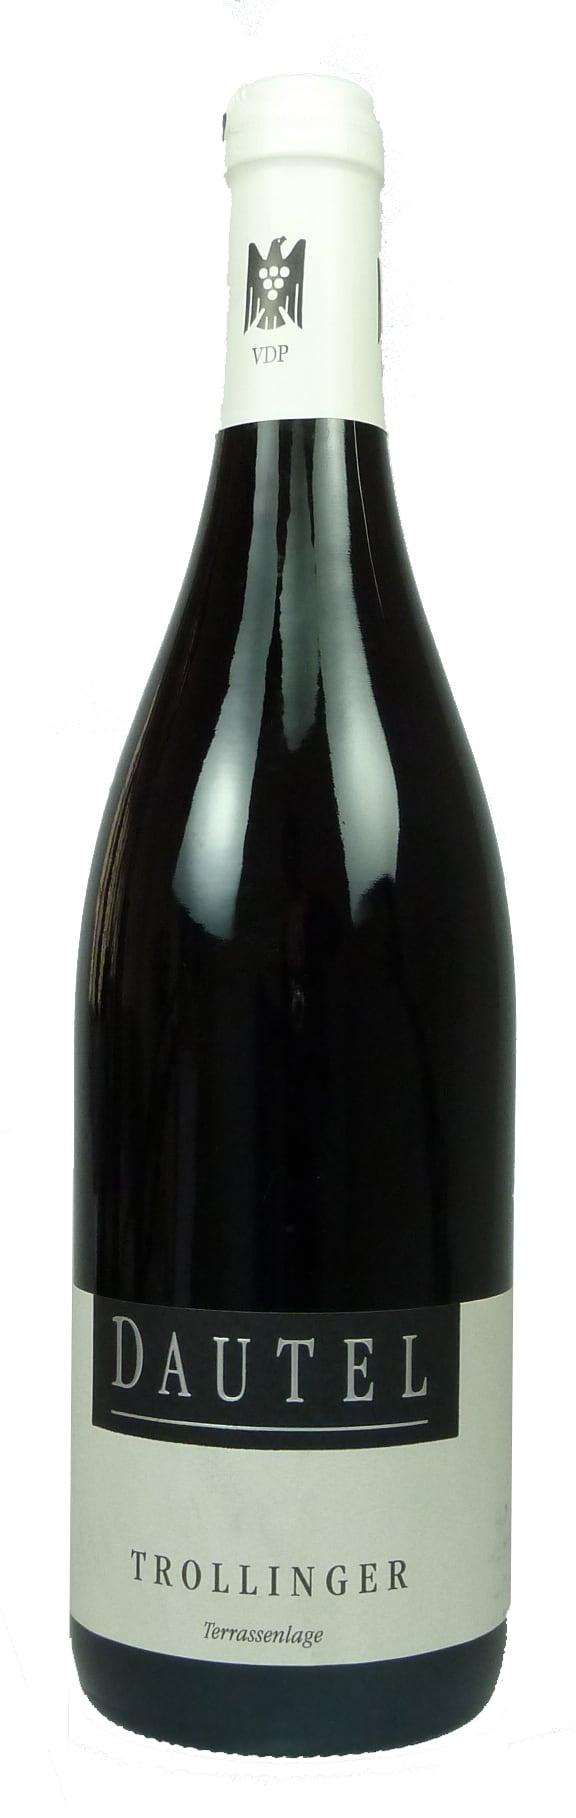 Trollinger Qualitätswein trocken 2016